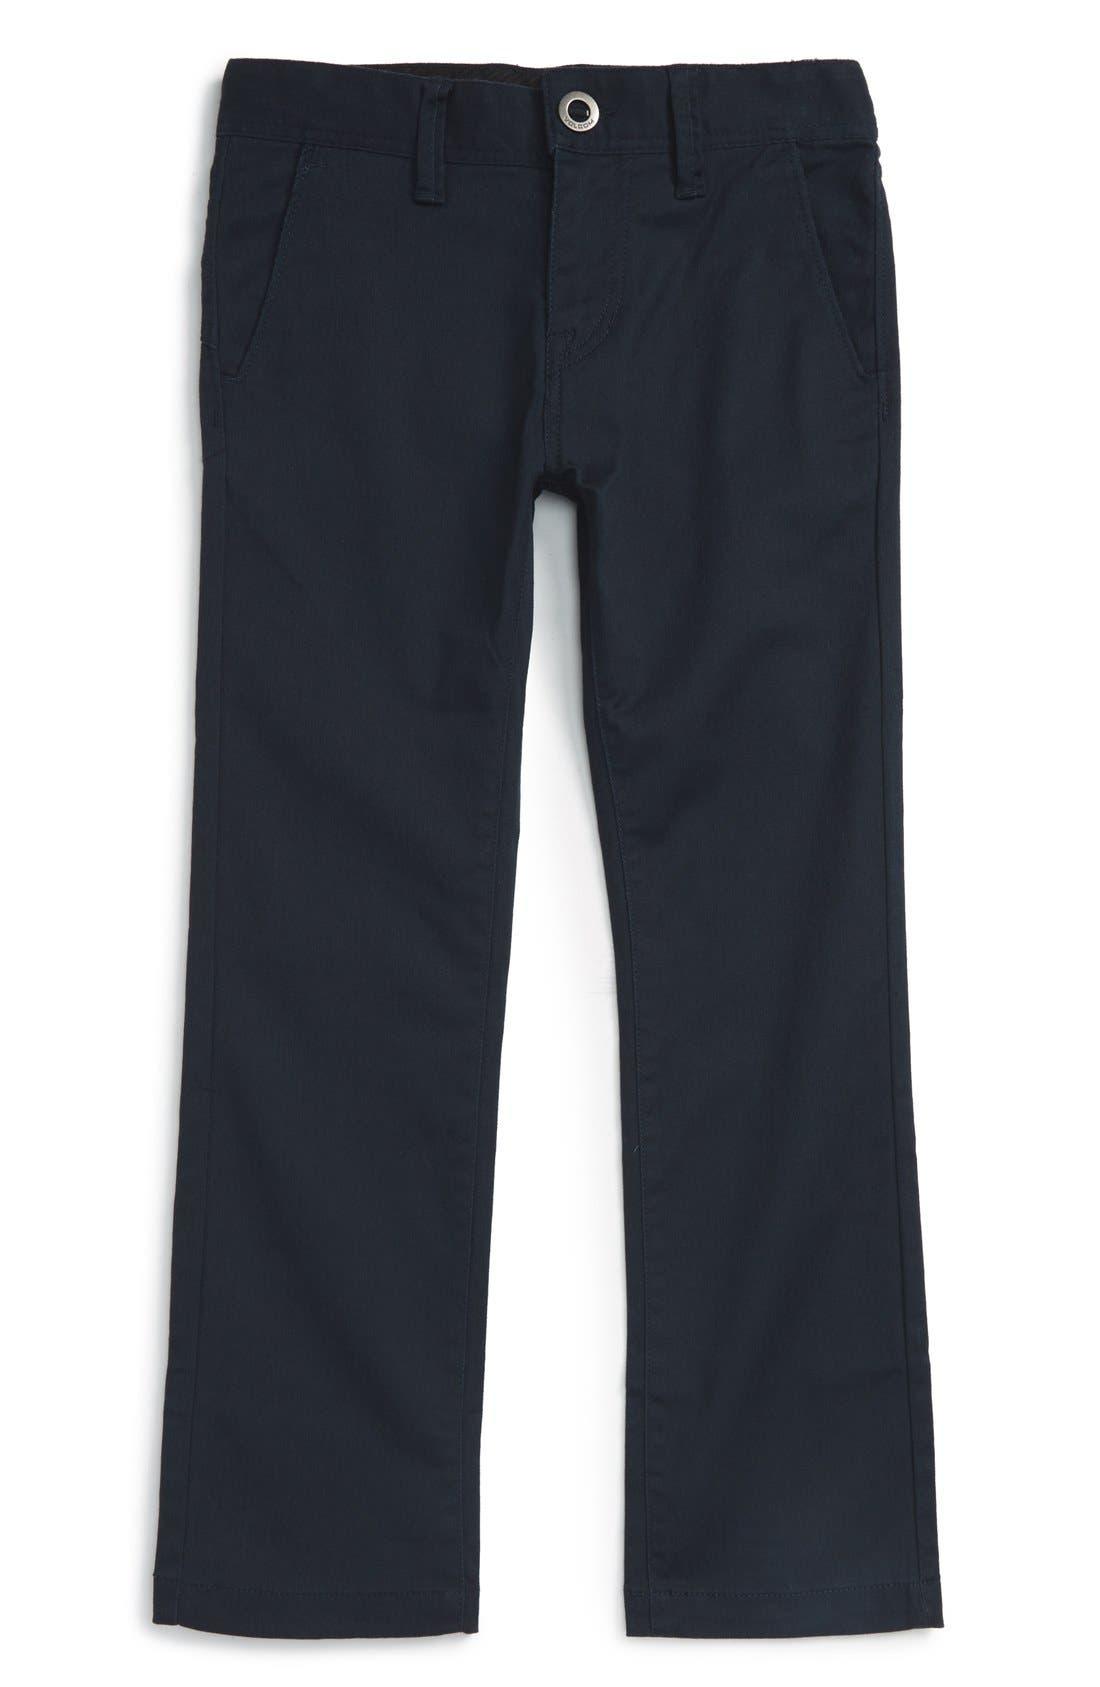 Boys Volcom Modern Stretch Chinos Size 5  Blue